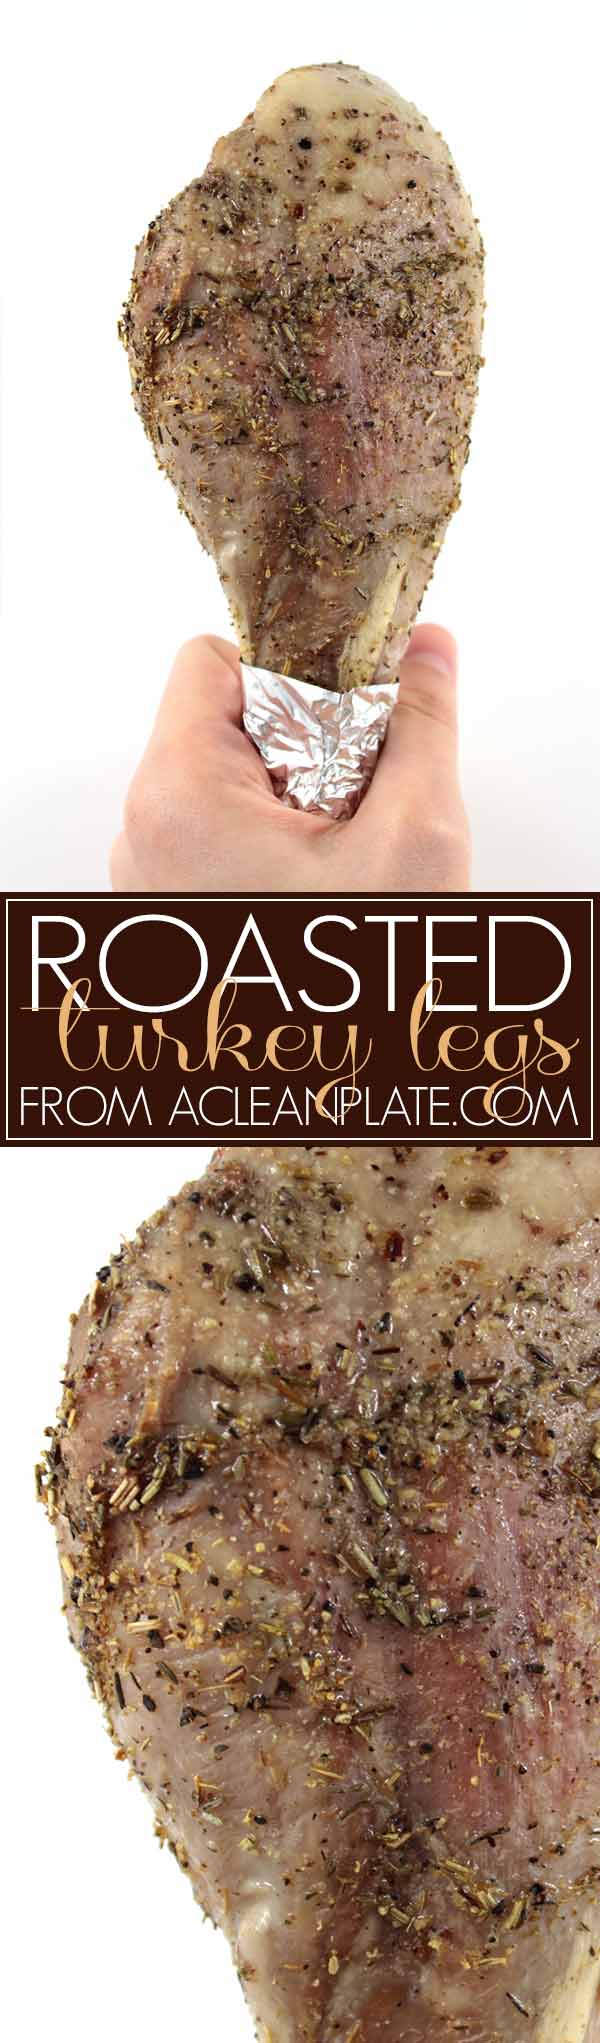 Roasted Turkey Legs recipe from acleanplate.com